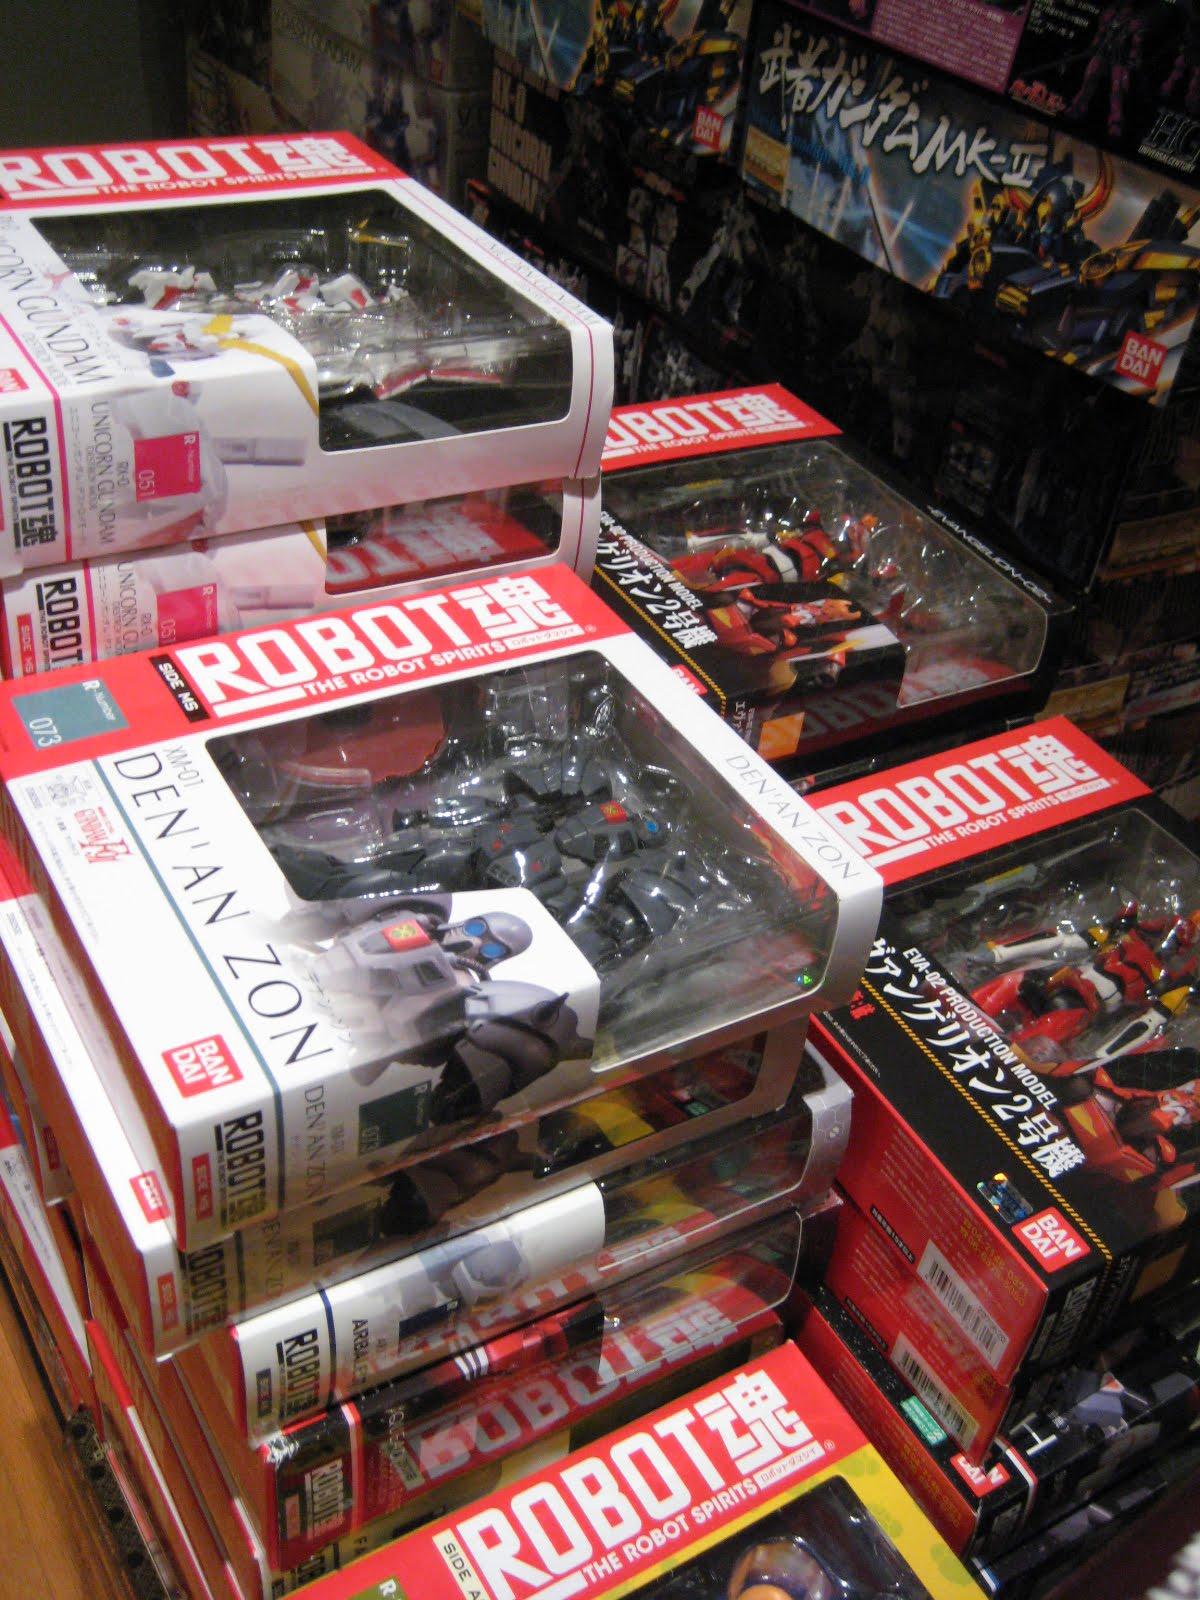 Job Trailers asian model kit hobby stores in toronto ontario area